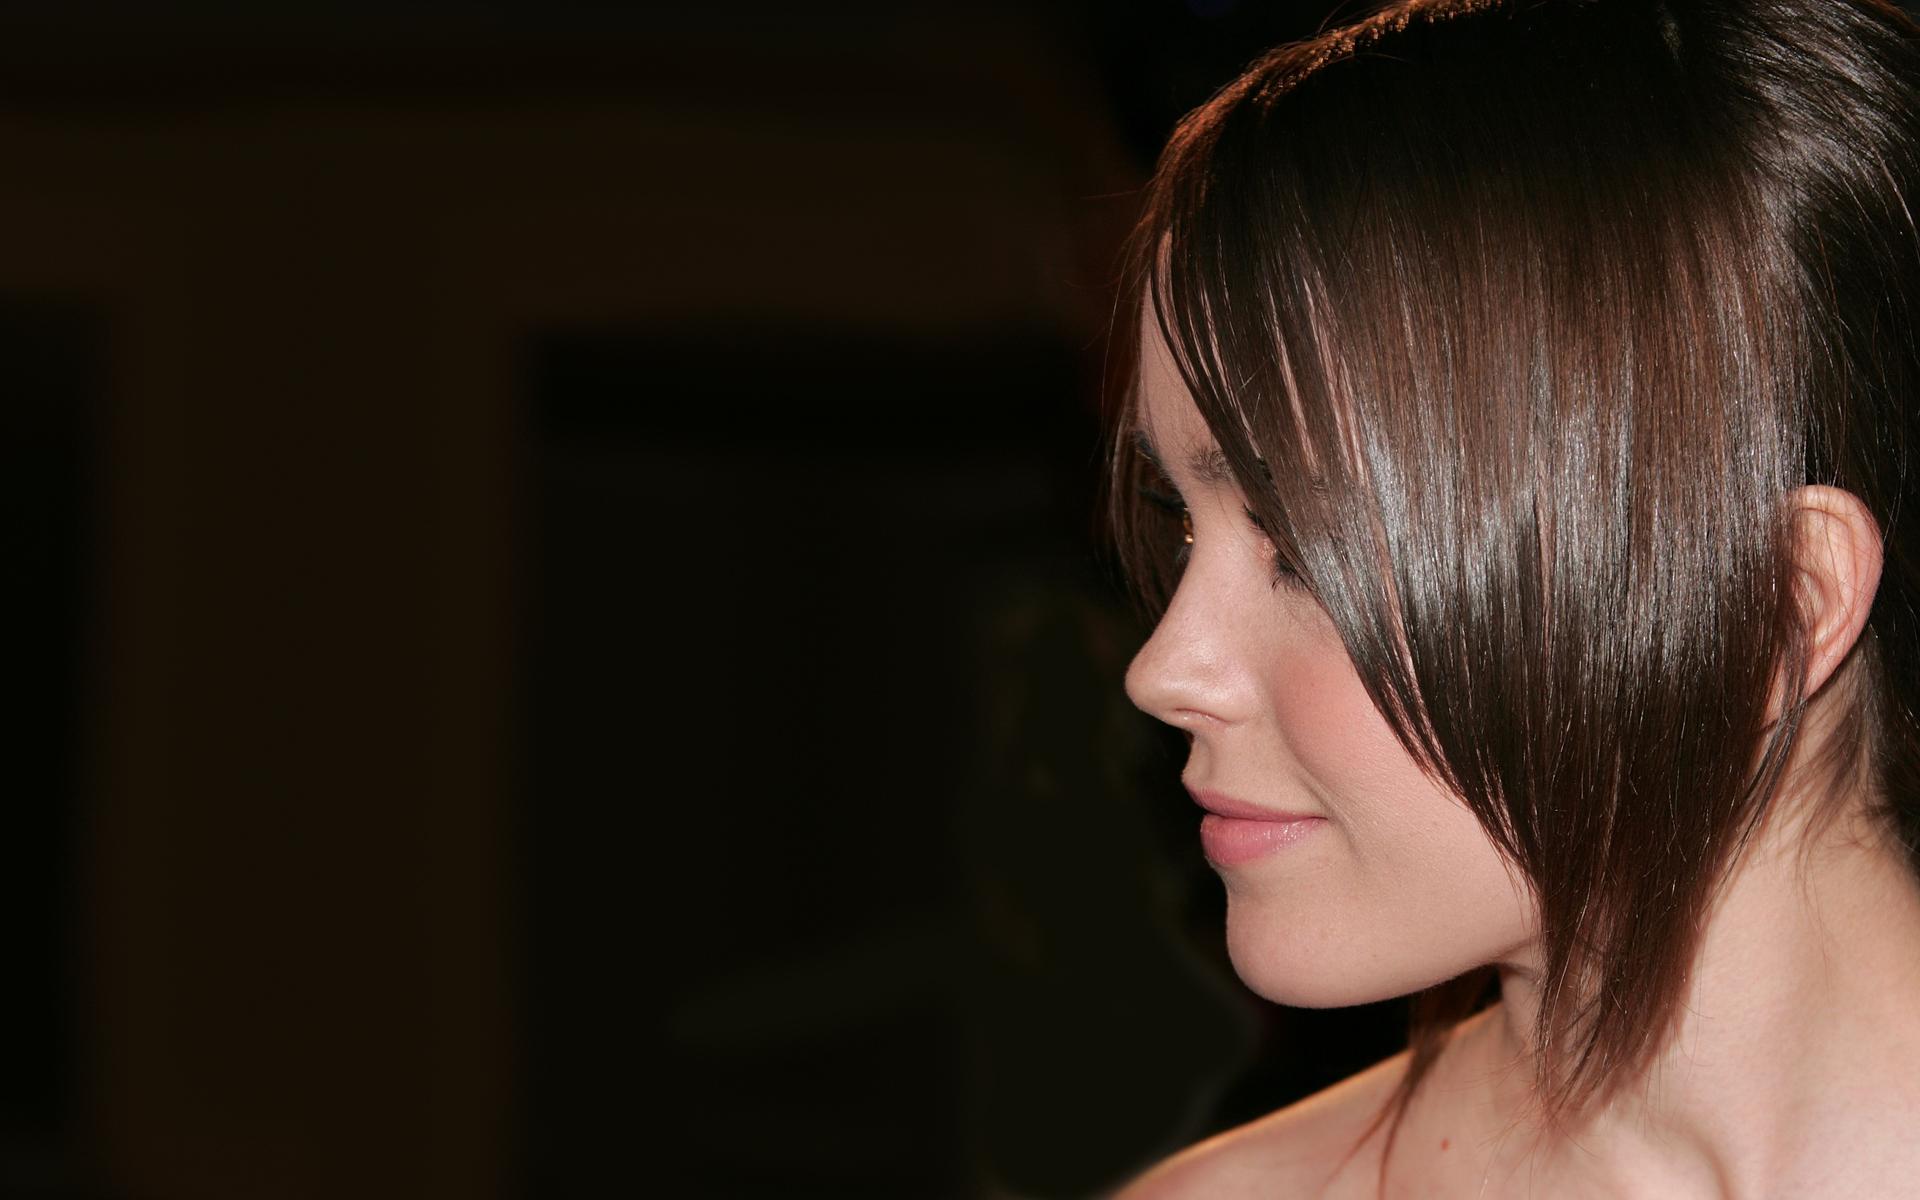 Ellen Page 2013 - 1920x1200